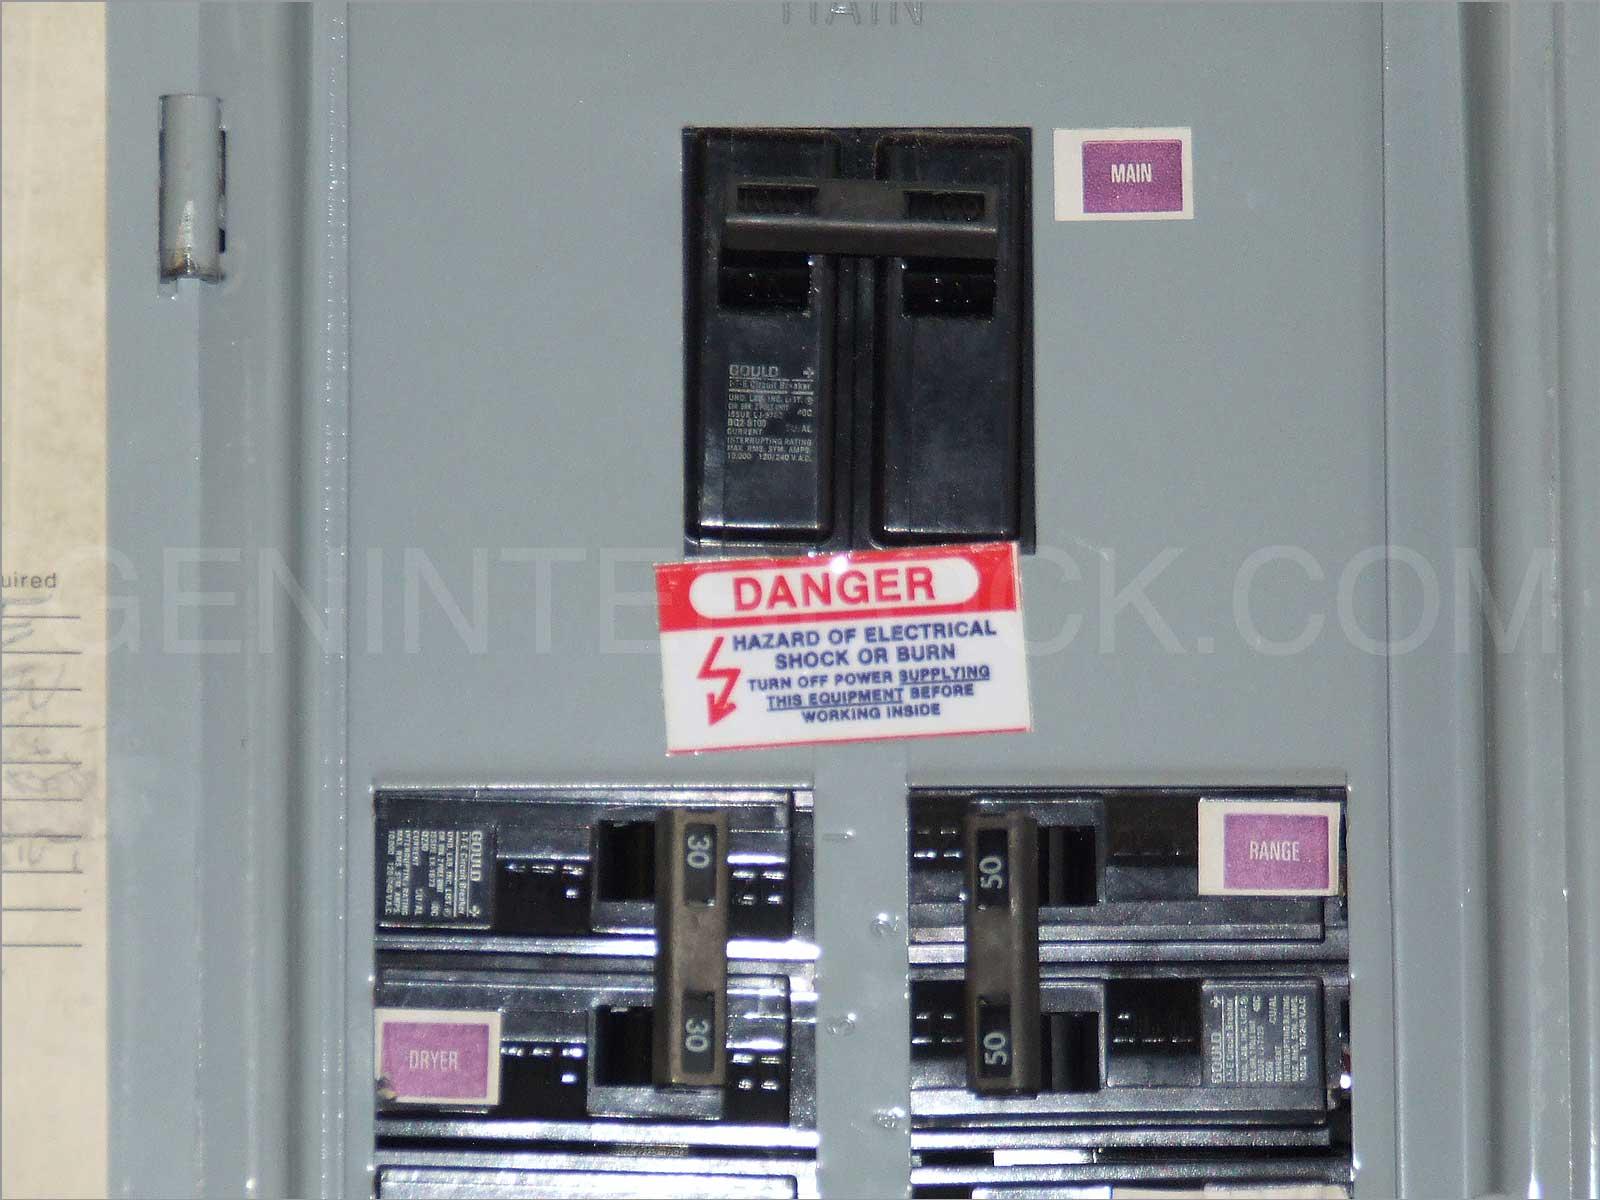 bryant electrical panel  | geninterlock.com